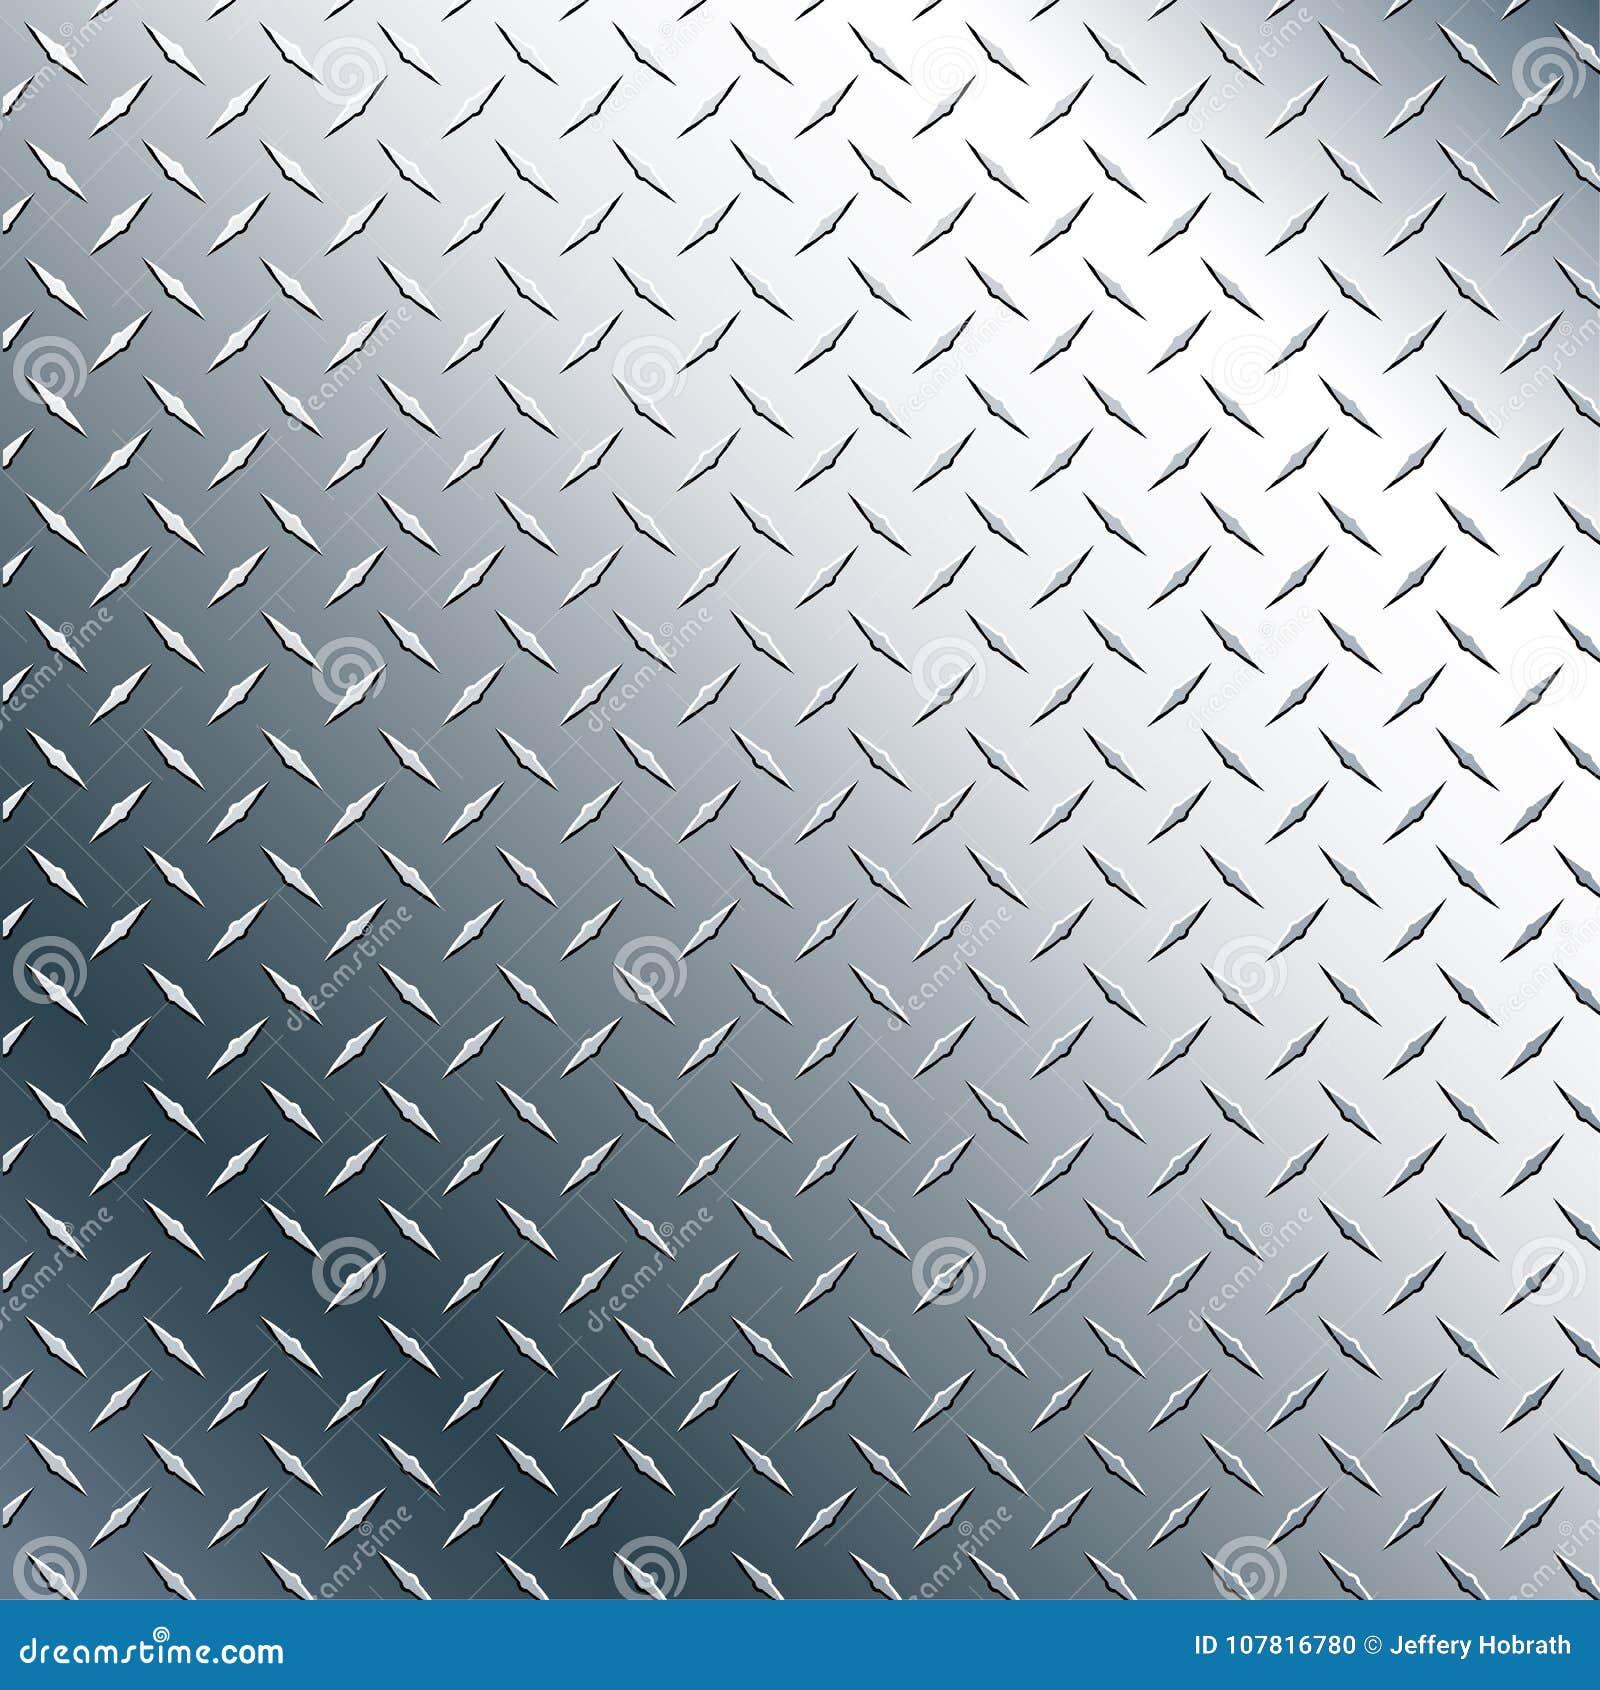 Illustration Chromes Diamond Plate Realistic Vector Graphic